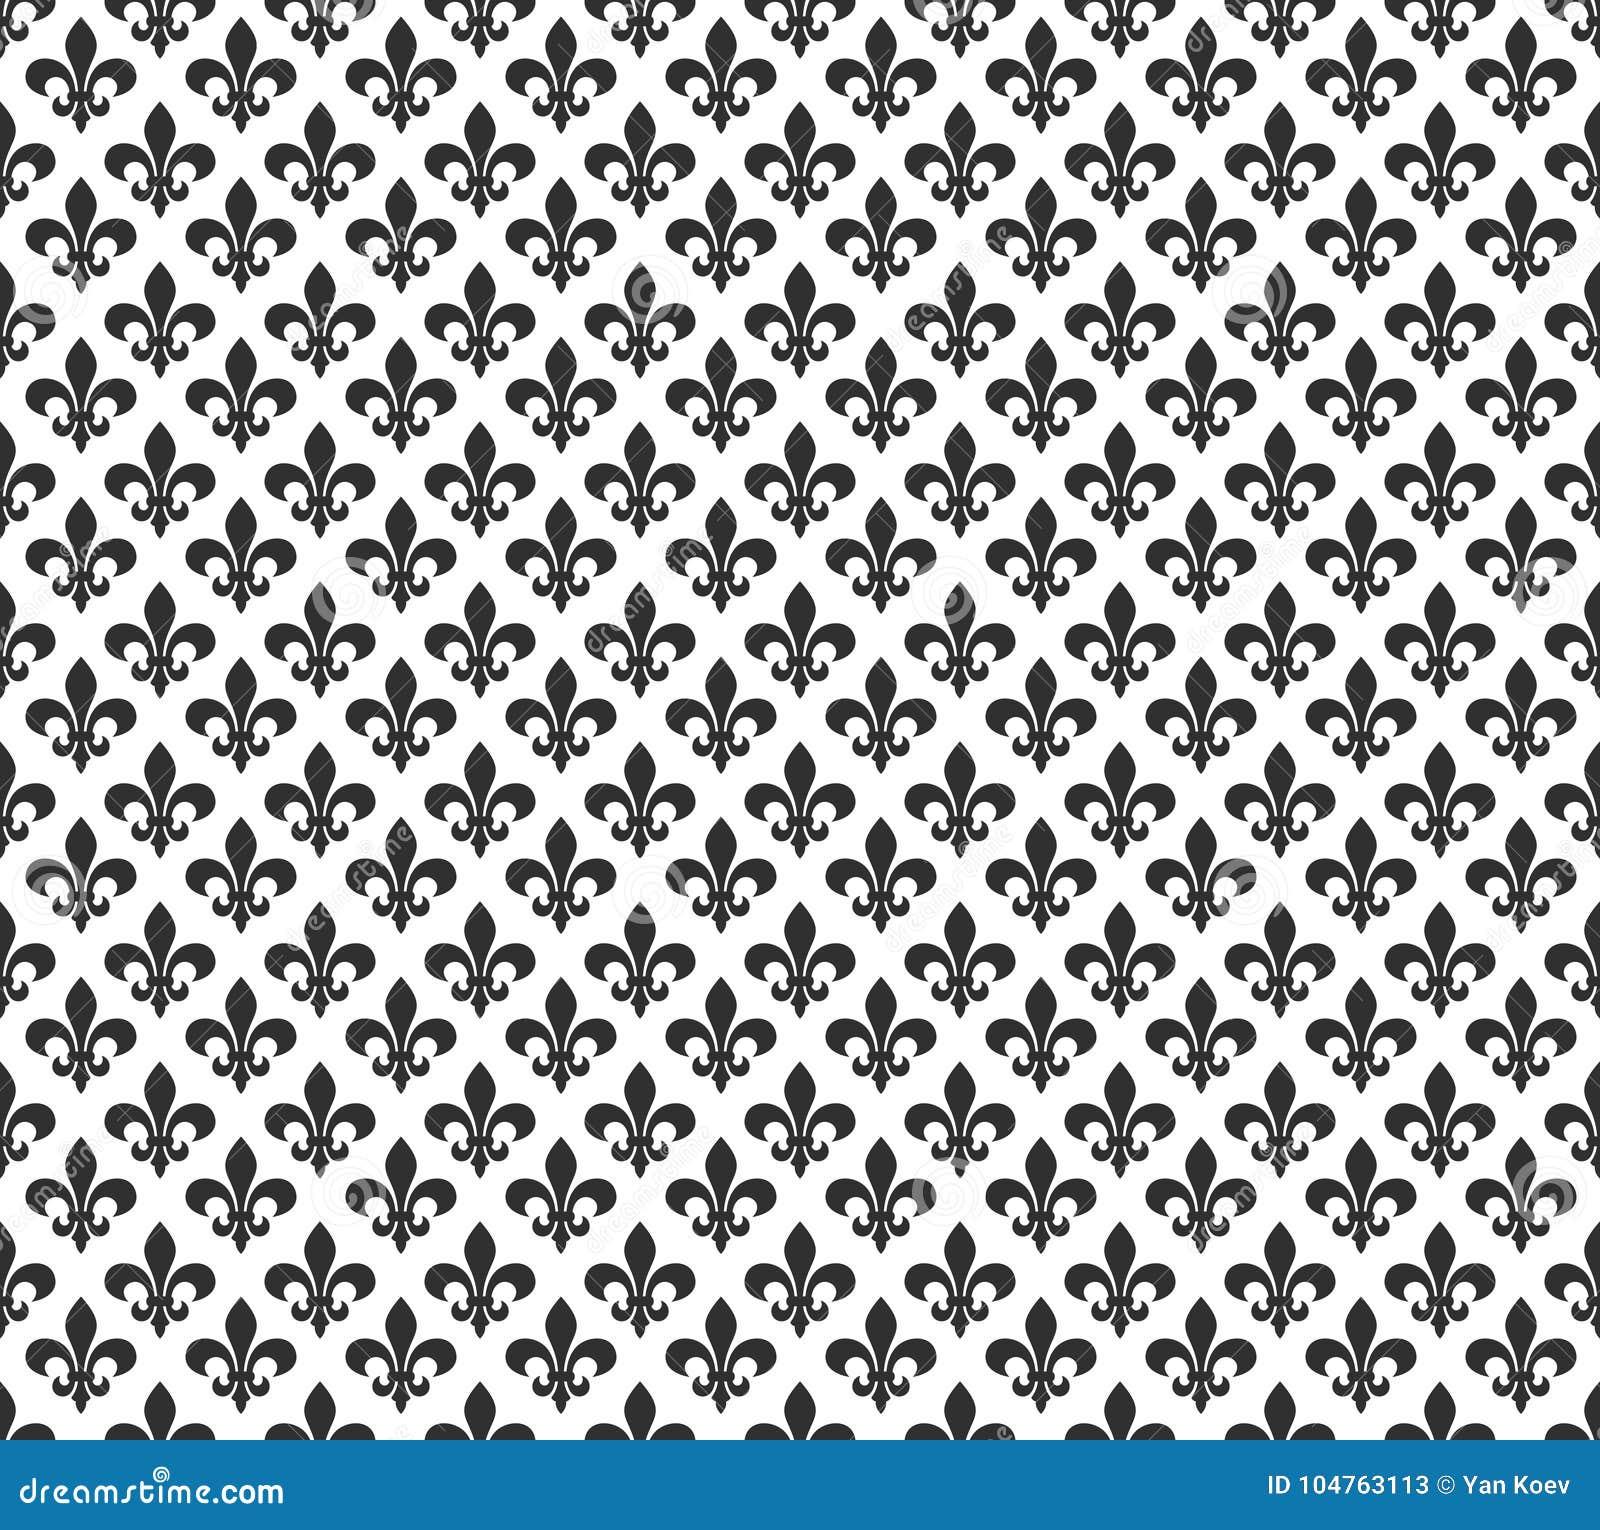 Fleur De Lis Black And White Seamless Pattern Background Stock